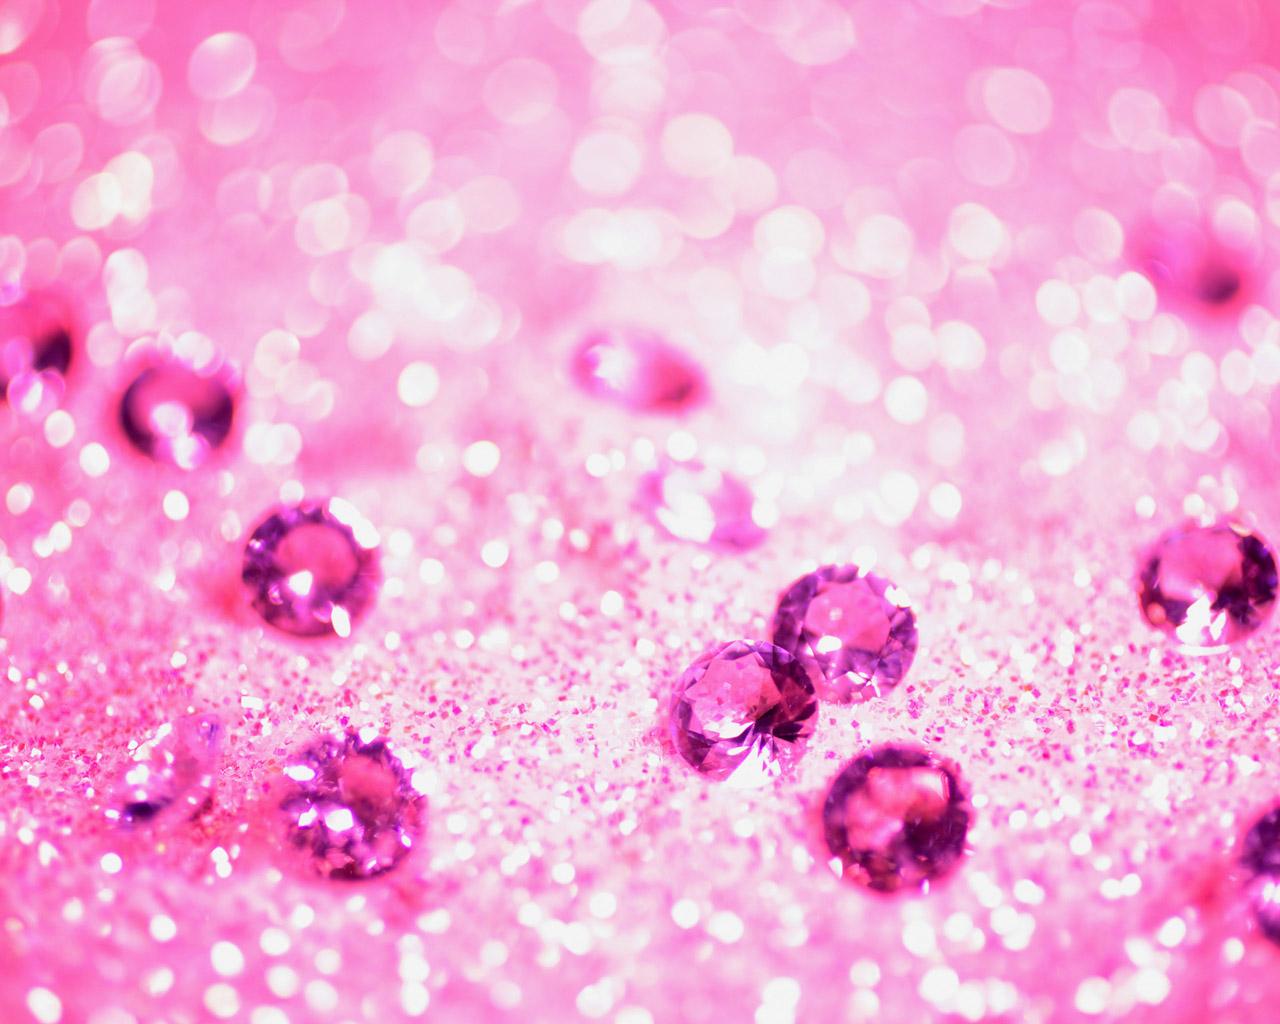 Pink Diamond Desktop Wallpaper here you can see Pink Diamond Desktop 1280x1024